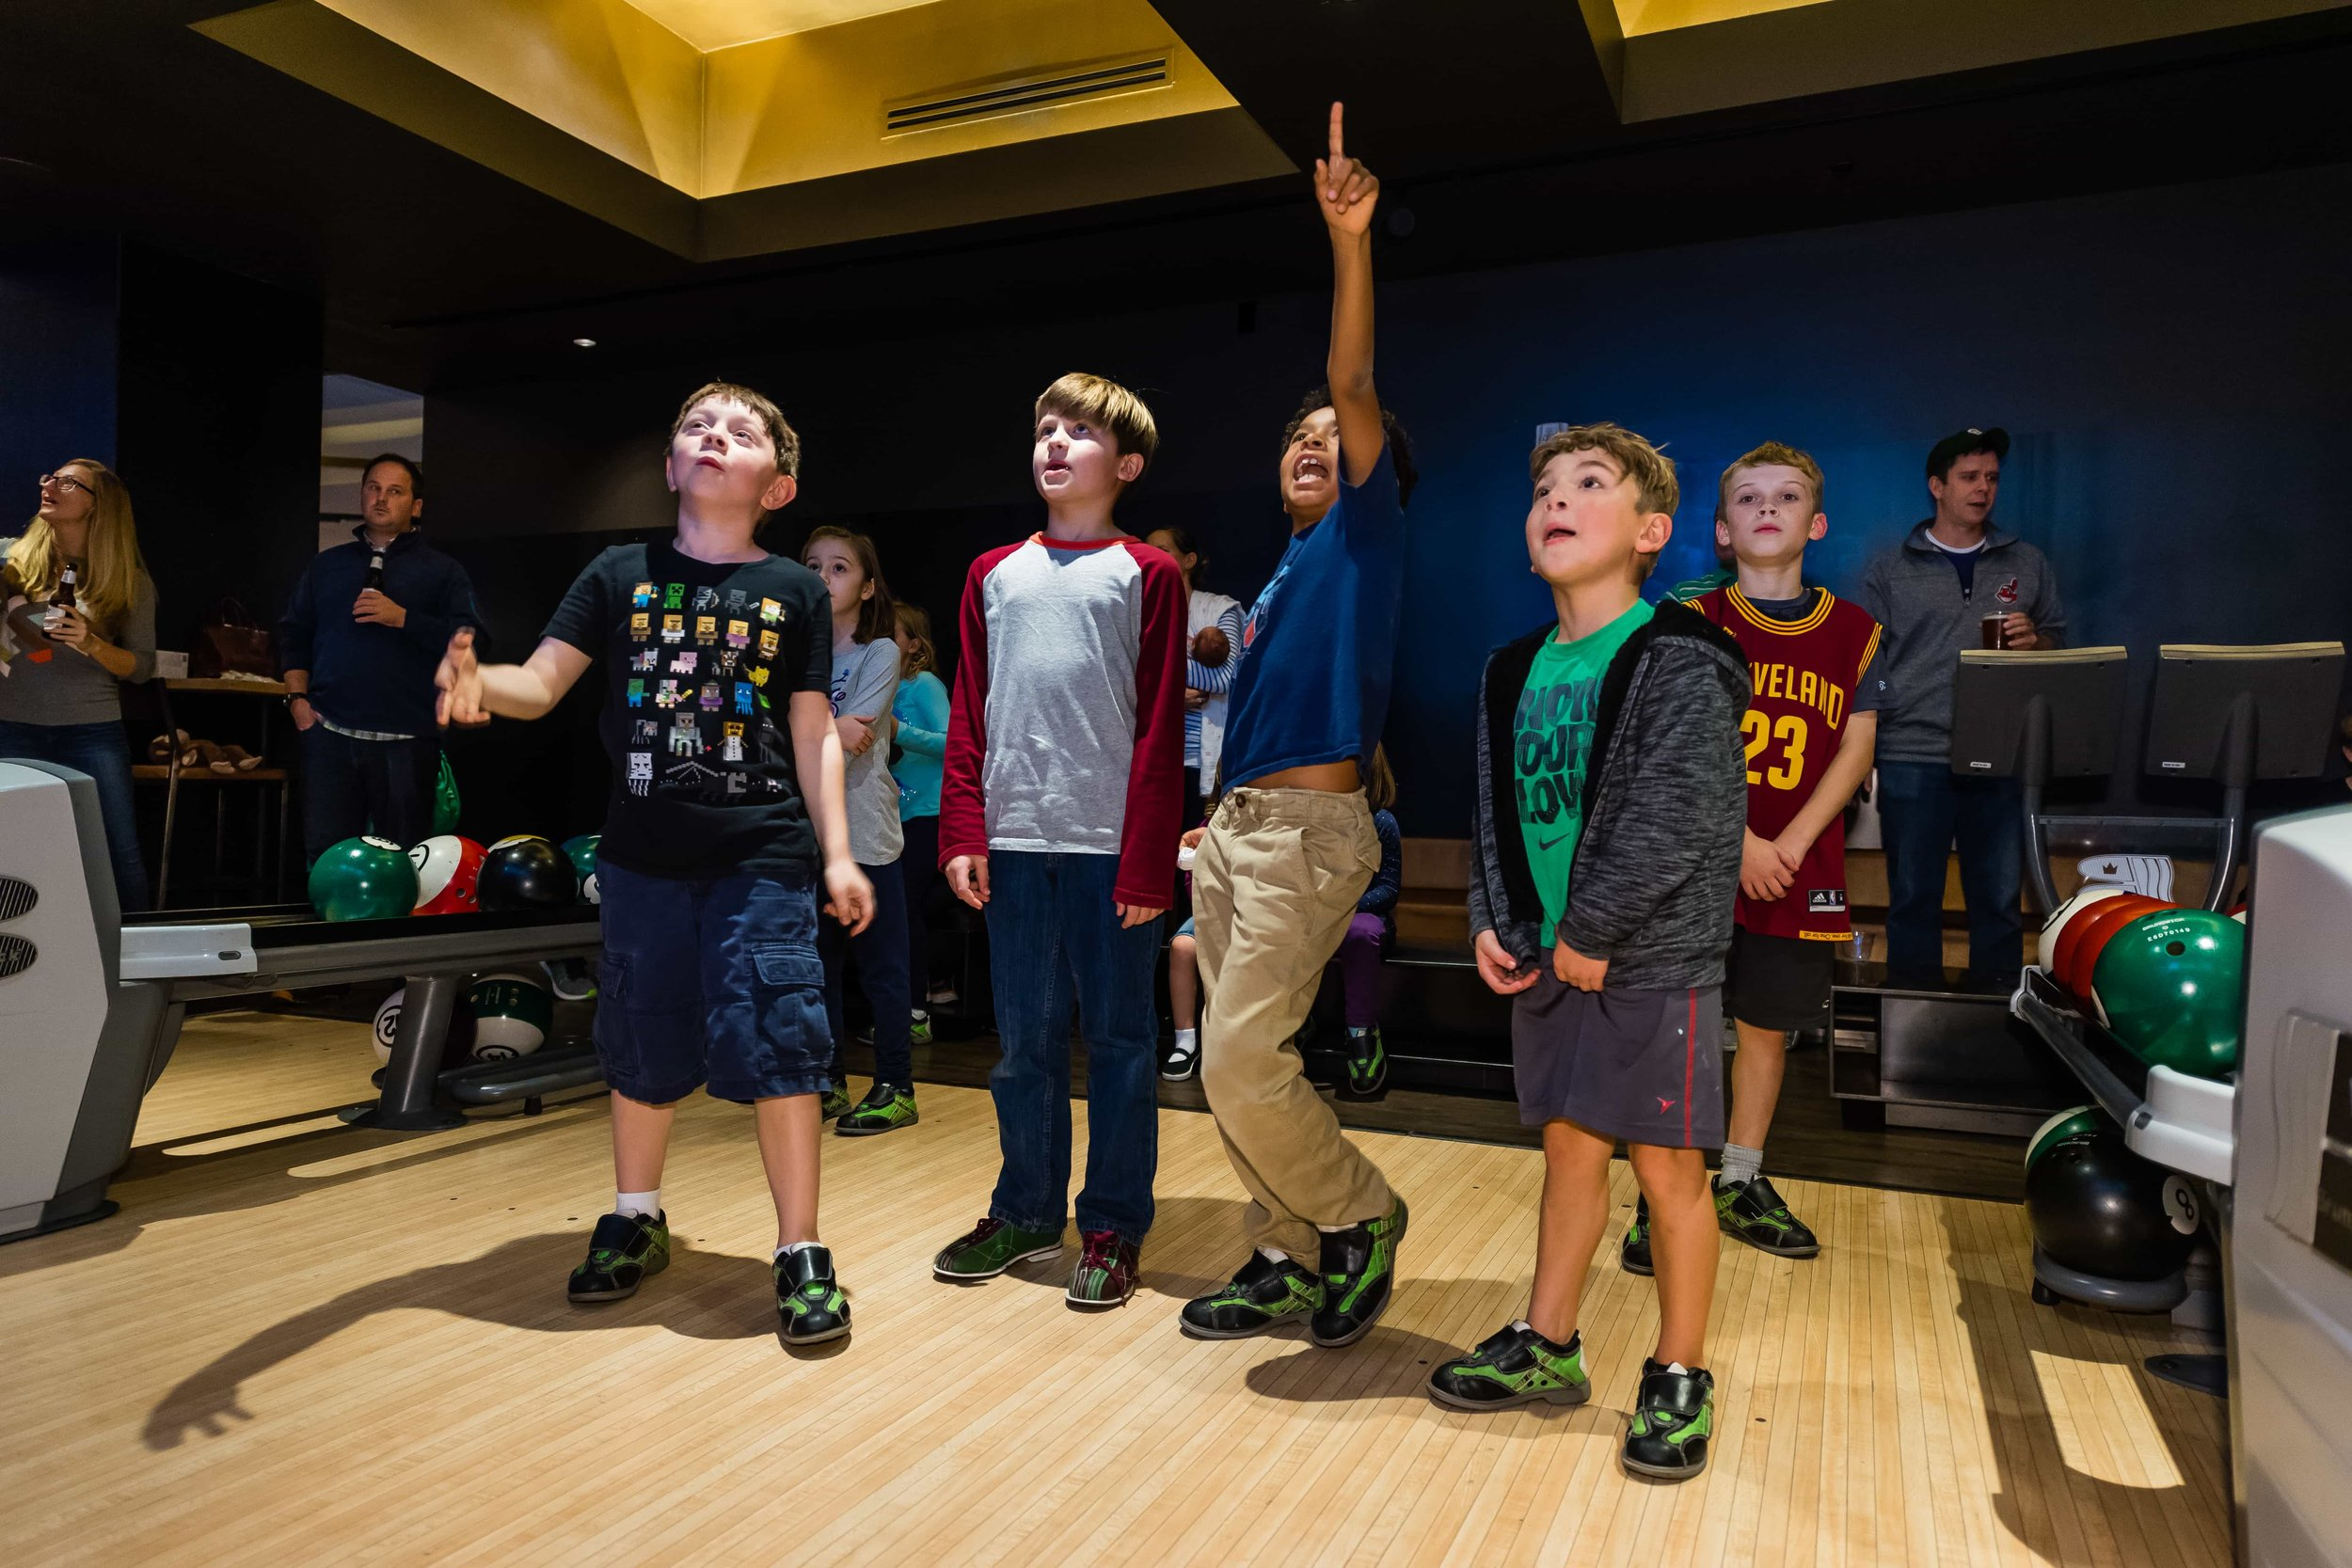 bowling-kids.jpg